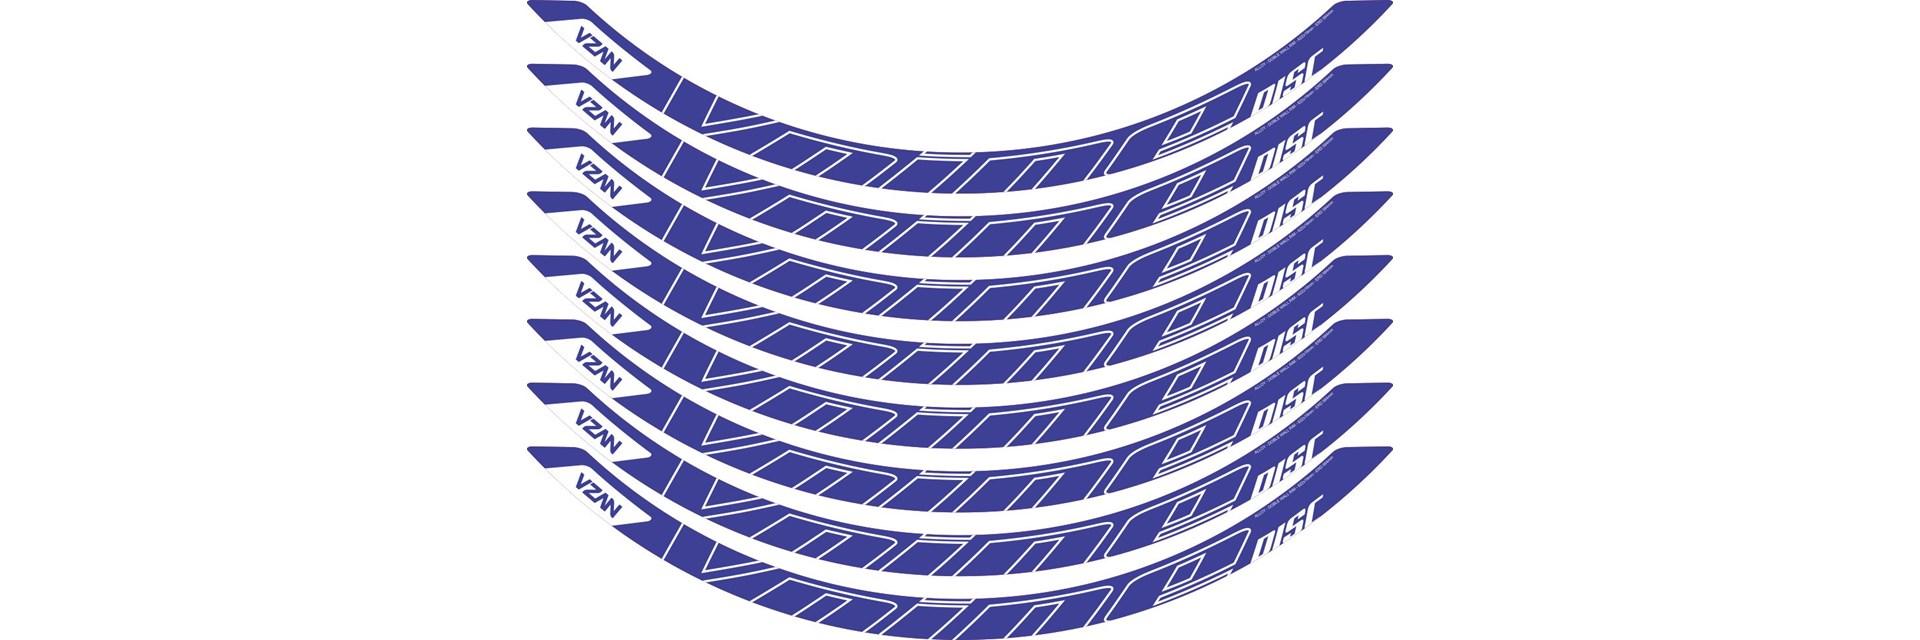 Adesivo Vnine 29 Disc Azul